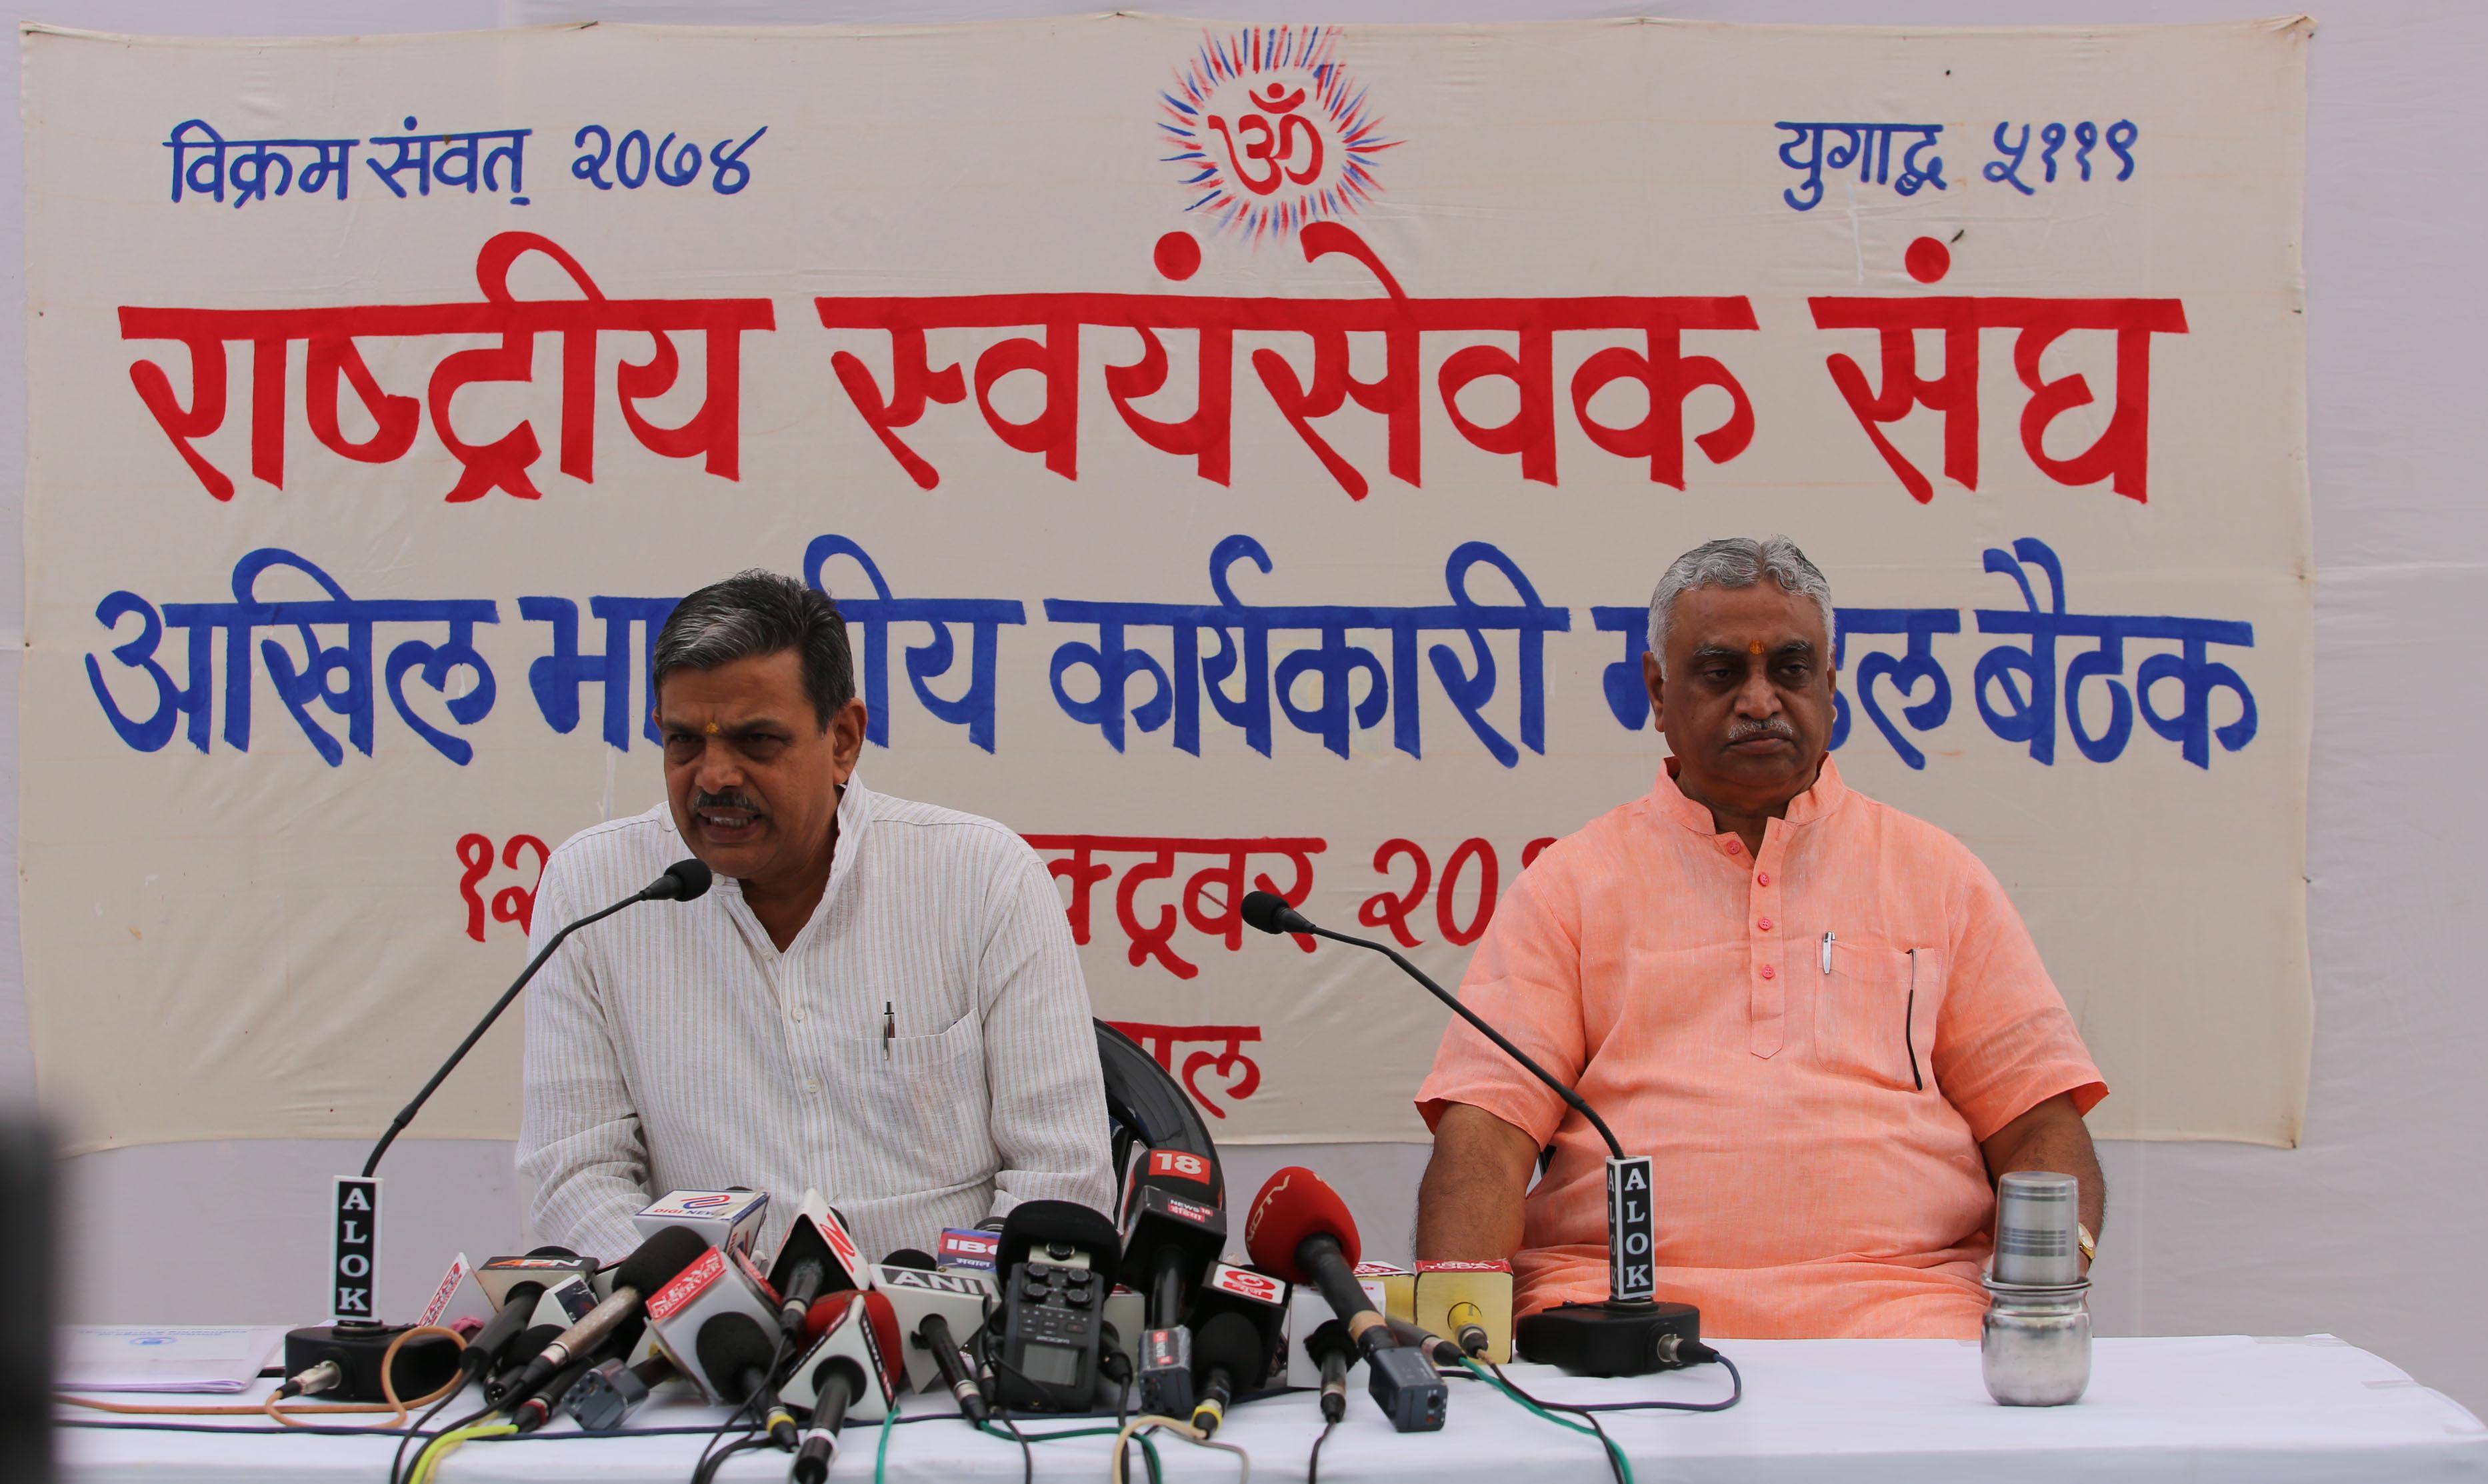 Sangh work is increasing pan Bharath : Dattatreya Hosabale at Day1 ABKM, Bhopal